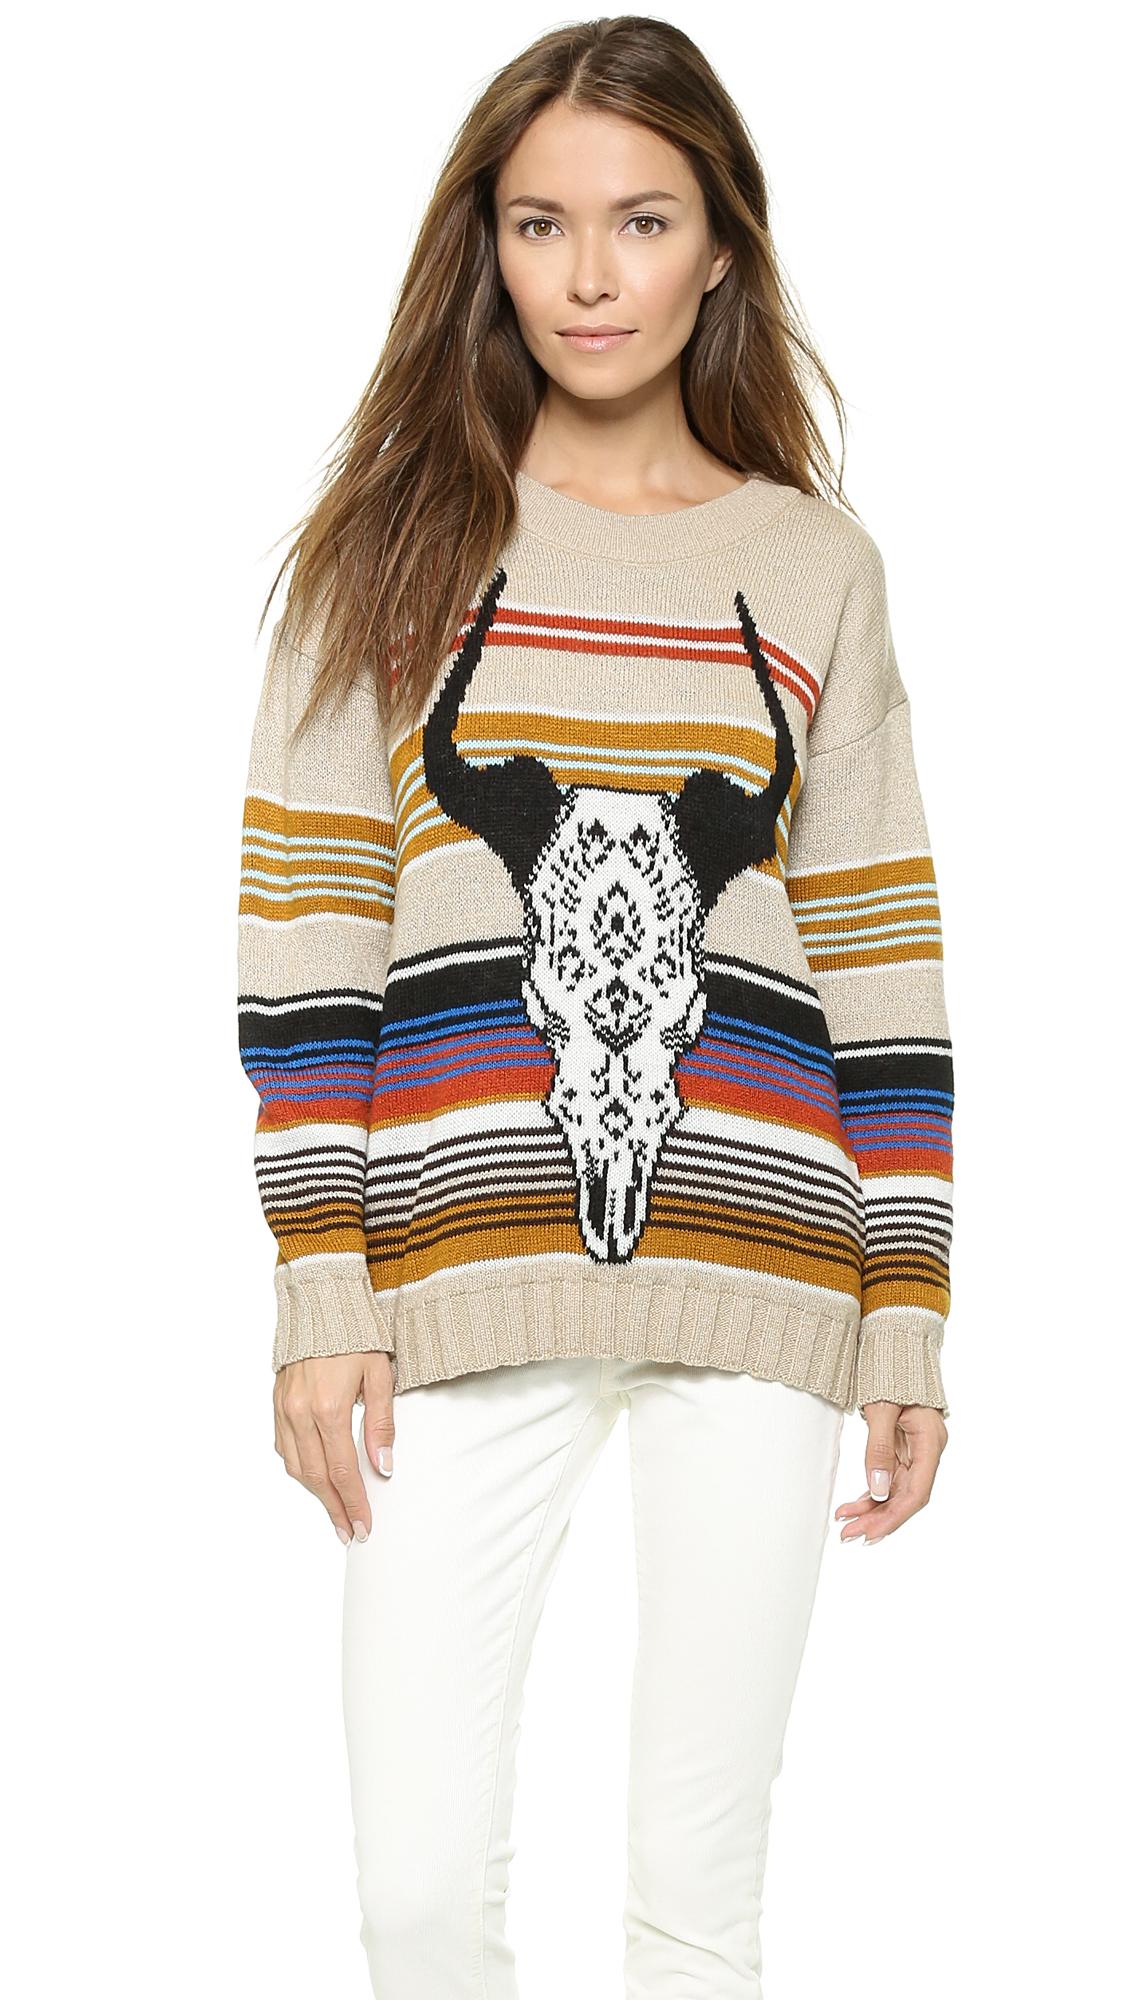 Jen's pirate booty reversible desert queen sweater